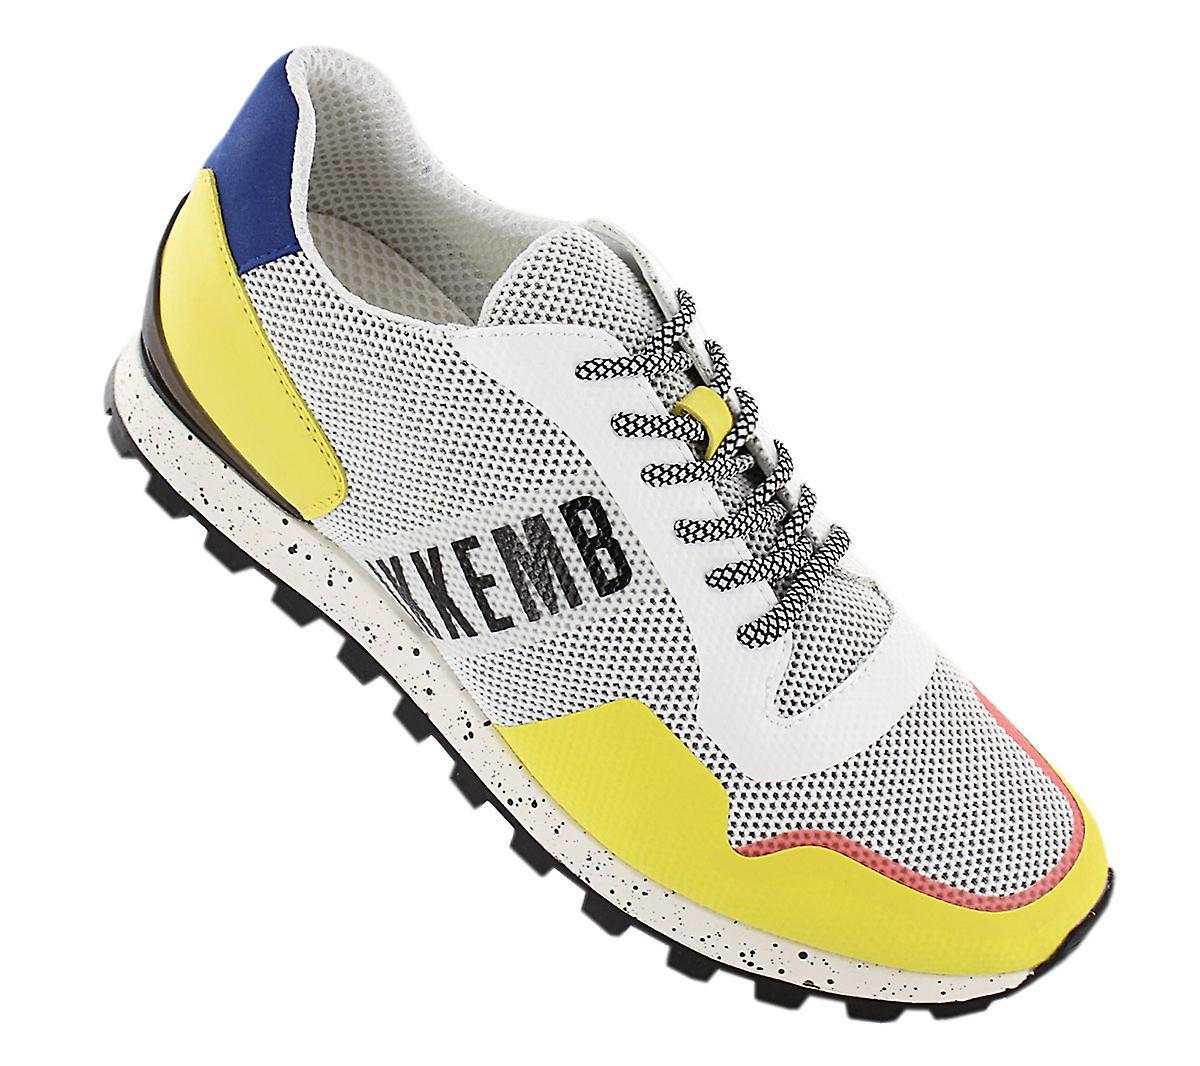 Bikkembergs Fend-er 2082 BKE108977 Herren Schuhe Weiß Sneakers Sportschuhe Wvj4Ks